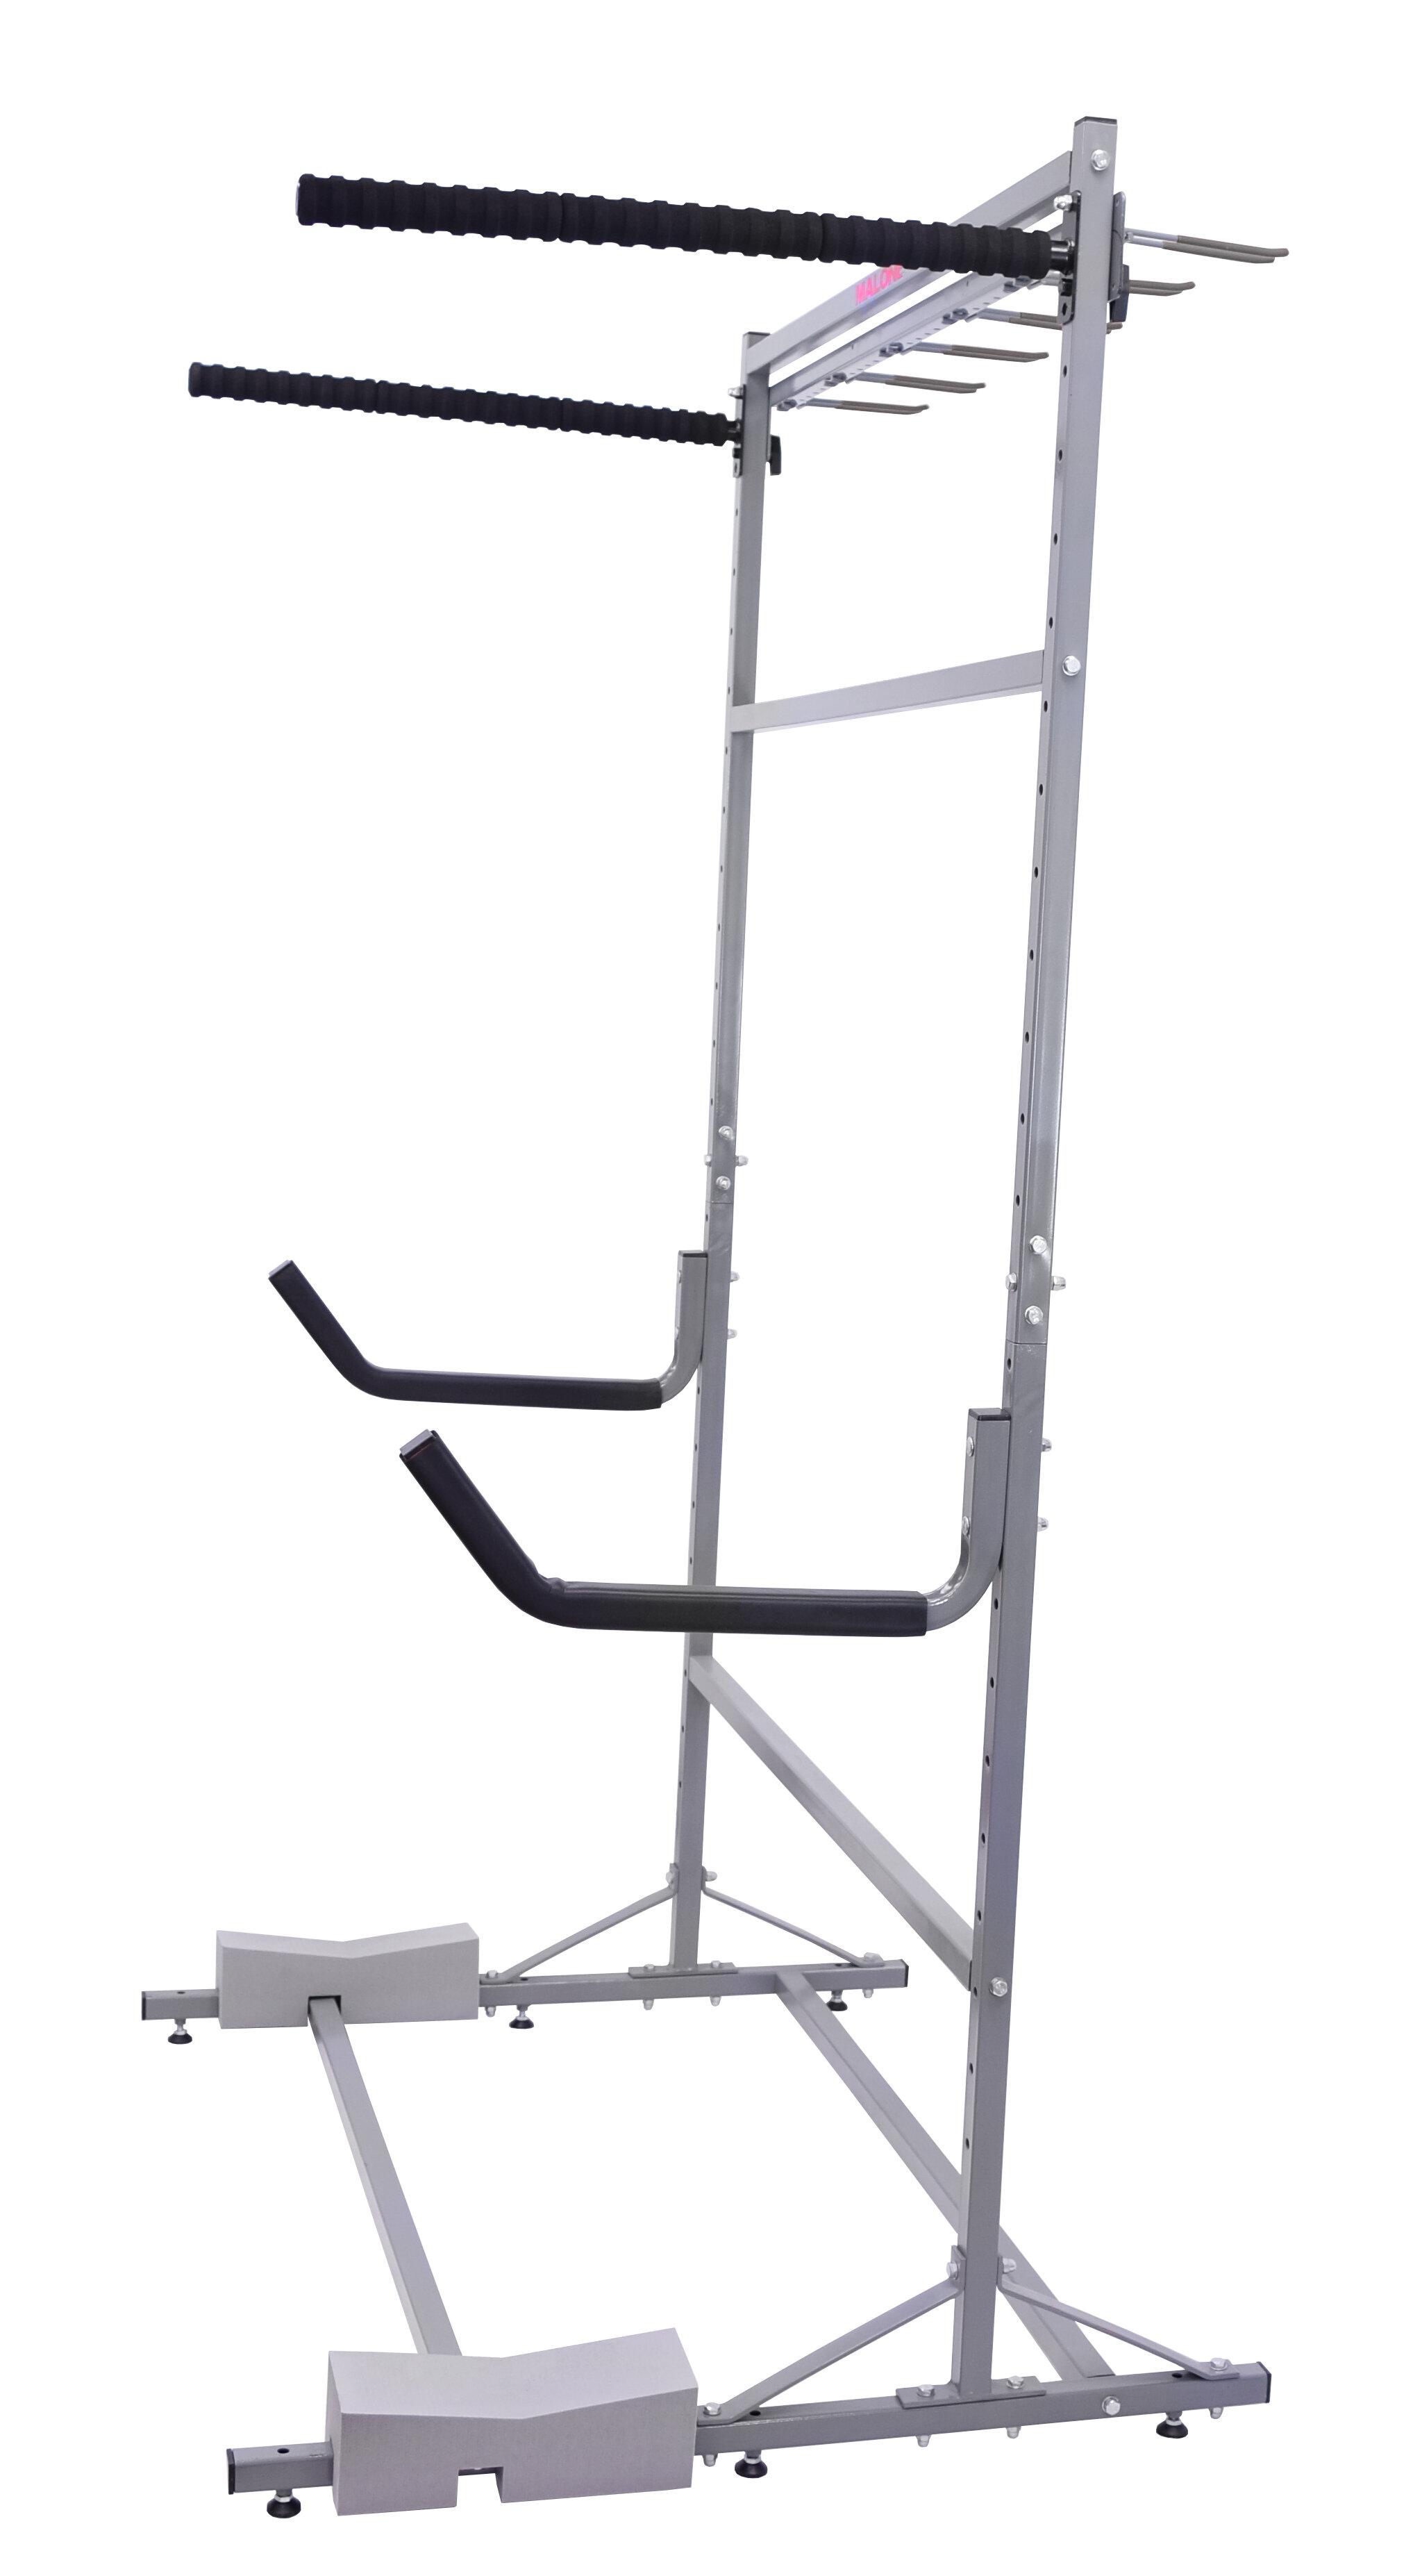 Support Velo Au Plafond freestanding rack